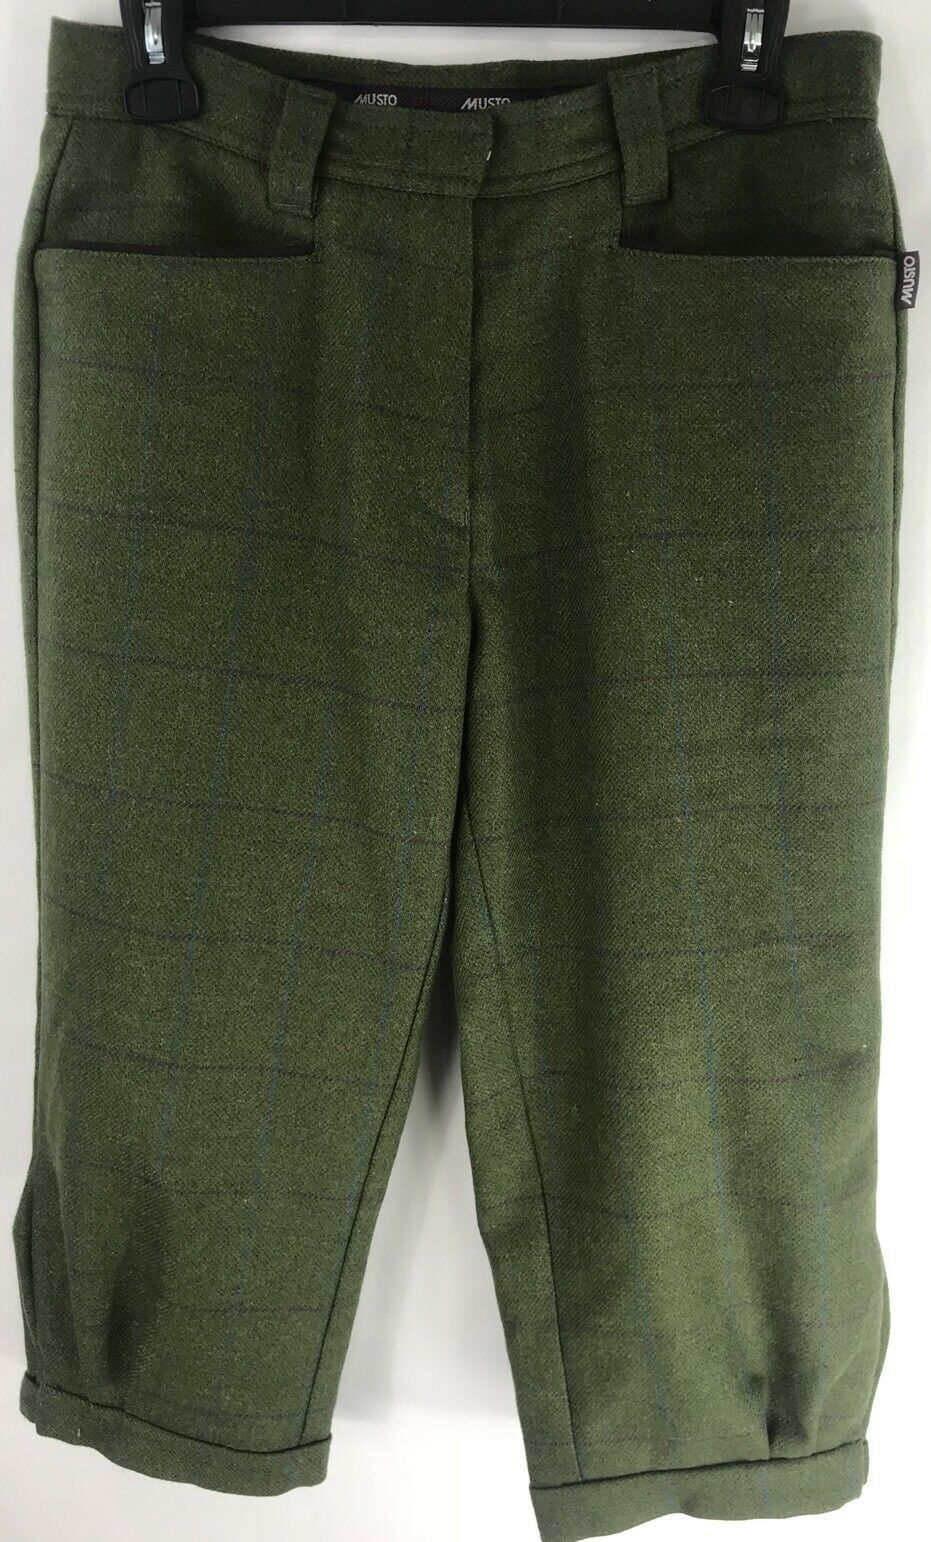 Musto Stretch Tech Tweed Breeks size 6 Euro 38 No 95% Pure New Wool 5% Nylon